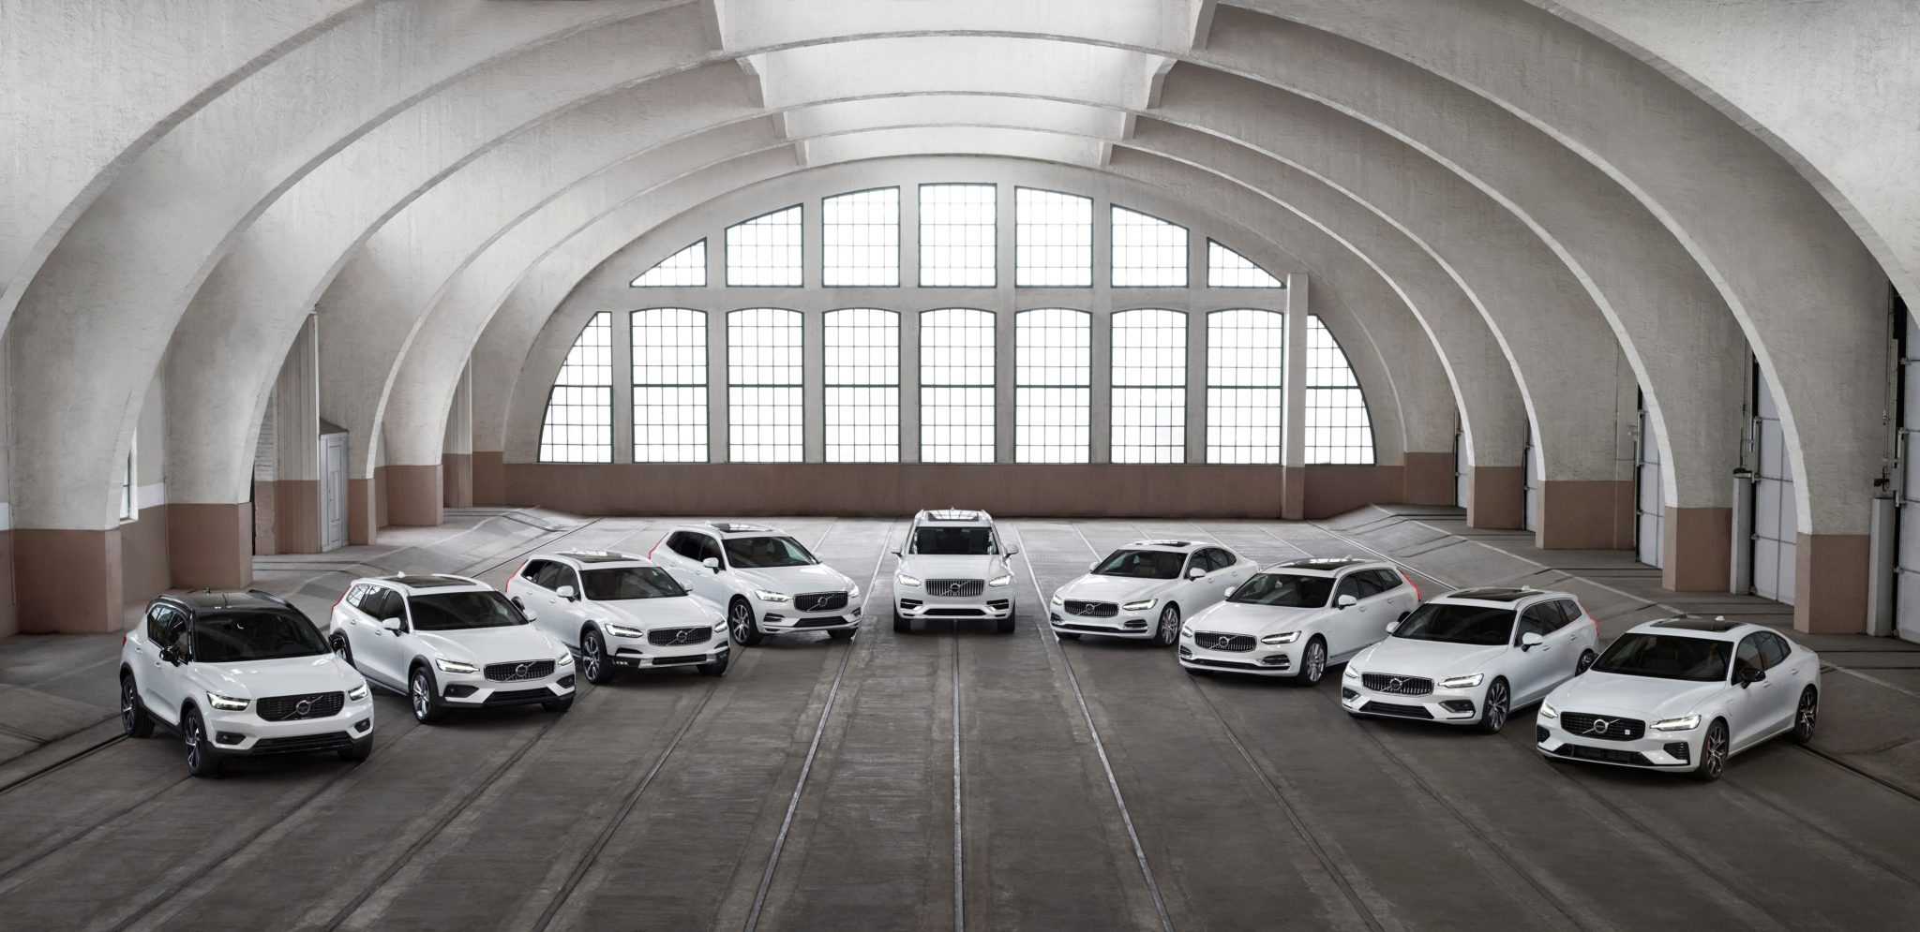 Volvo объявил о сохранении в июле прежних ставок на кредиты